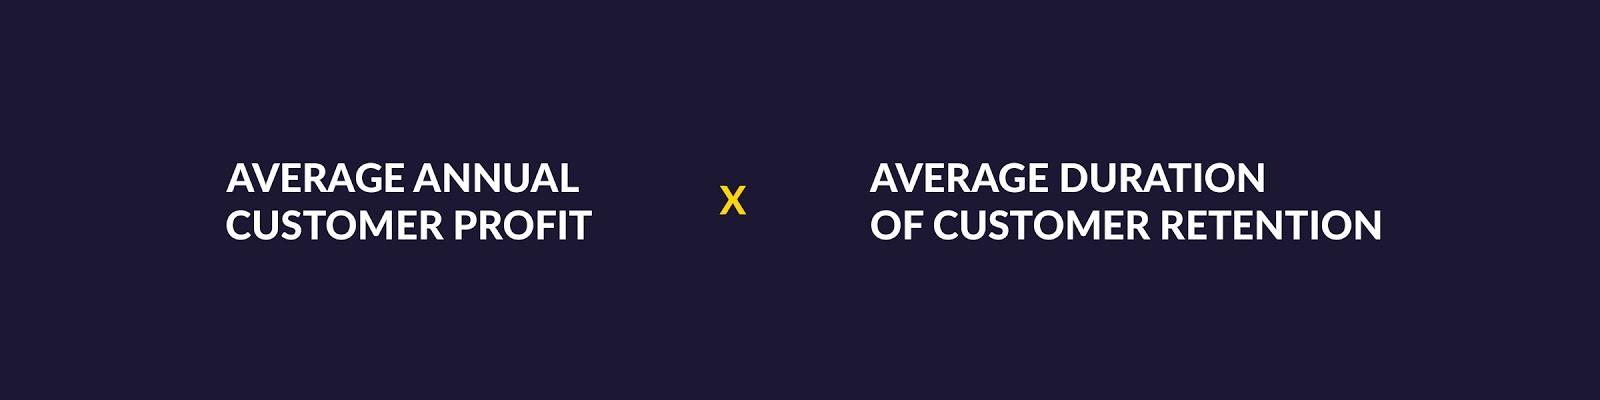 Average Annual Customer Profit x Average Duration of Customer Retention, via Exponea